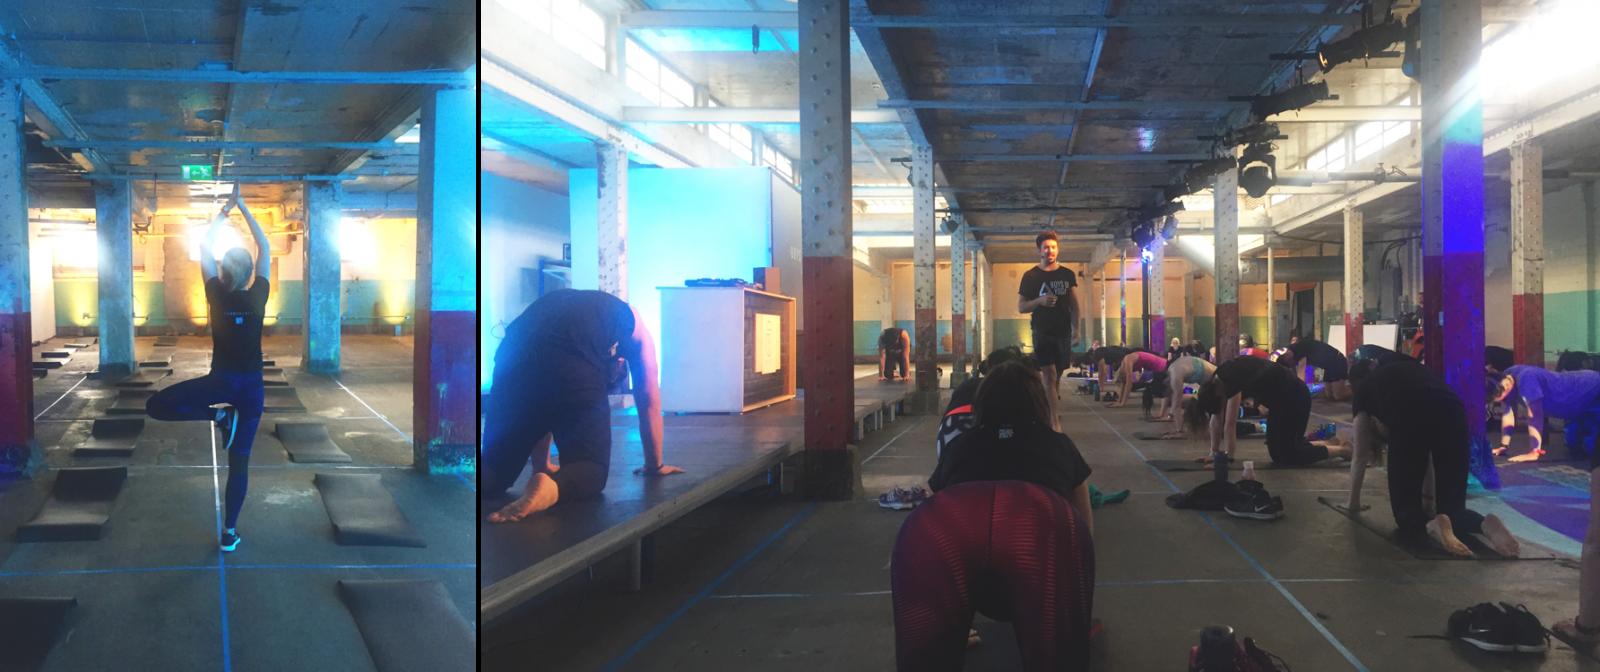 Boys-of-Yoga-1600x672.png